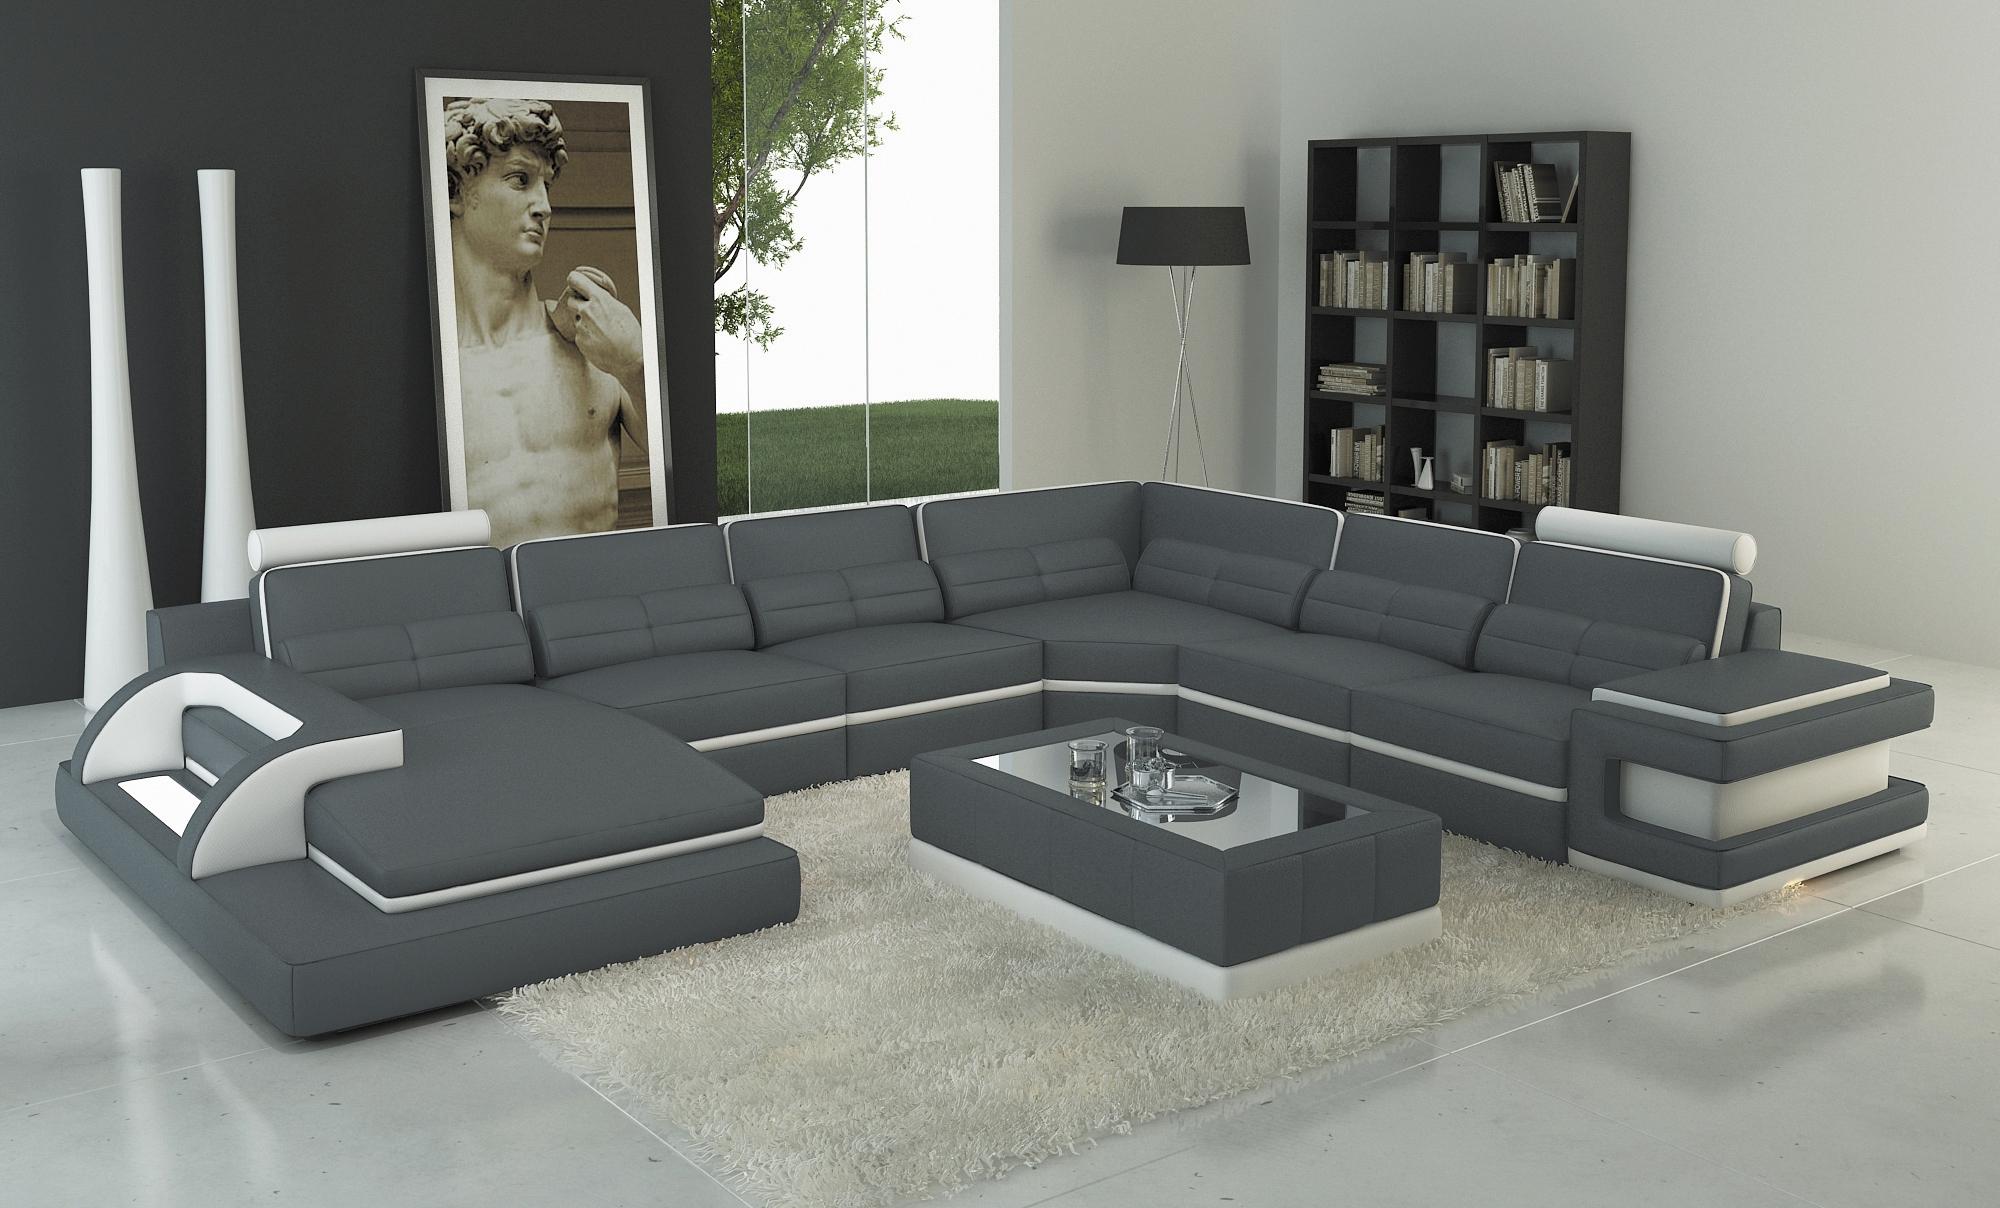 DECO IN PARIS 6 canape panoramique cuir gris et blanc